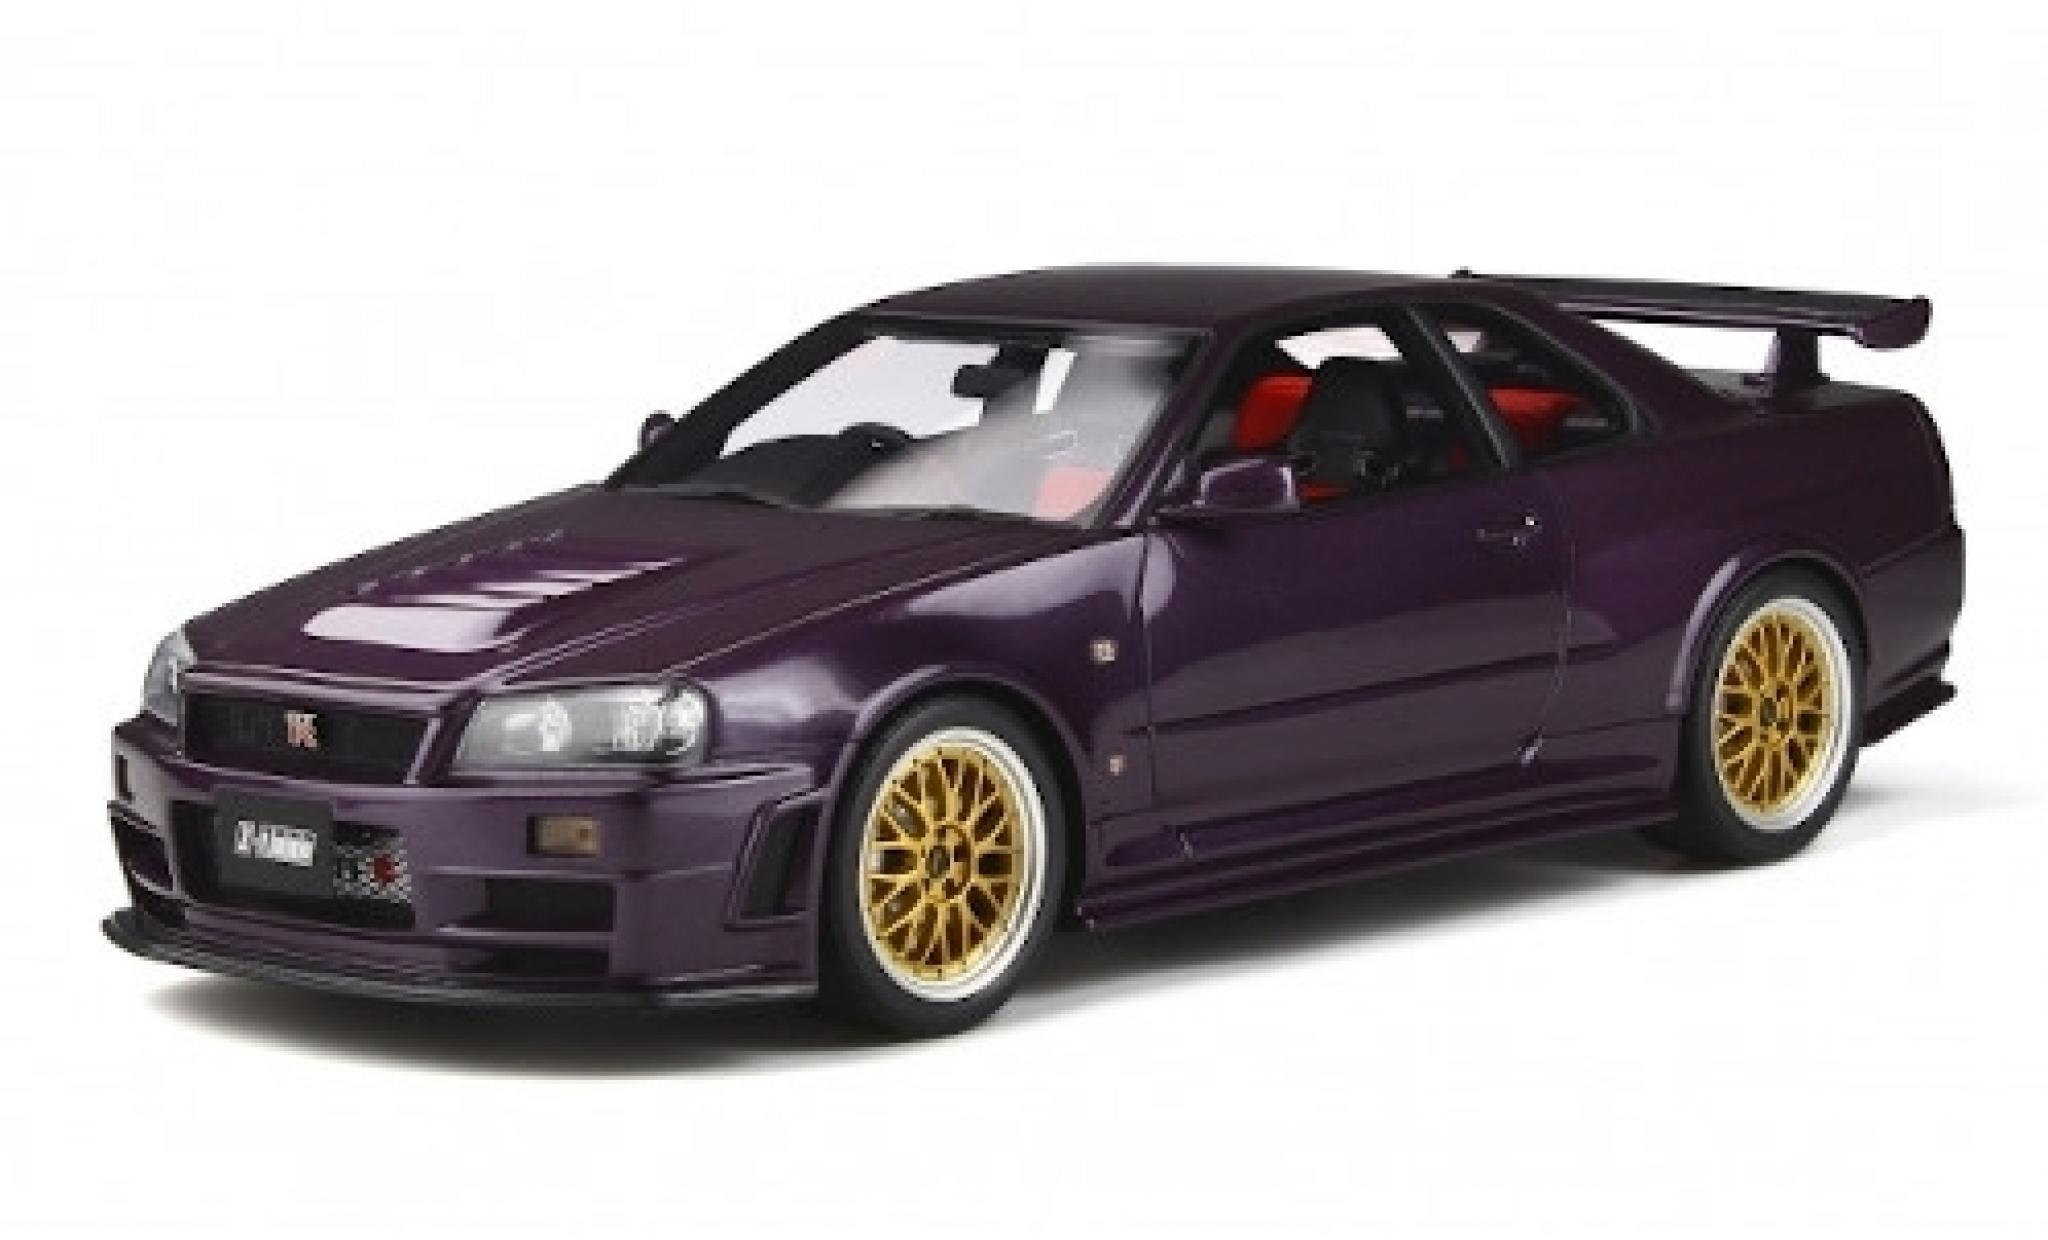 Nissan Skyline 1/18 Ottomobile GT-R (Z34) Nismo Z-Tune metallise violette RHD 1998 avec doré jantes